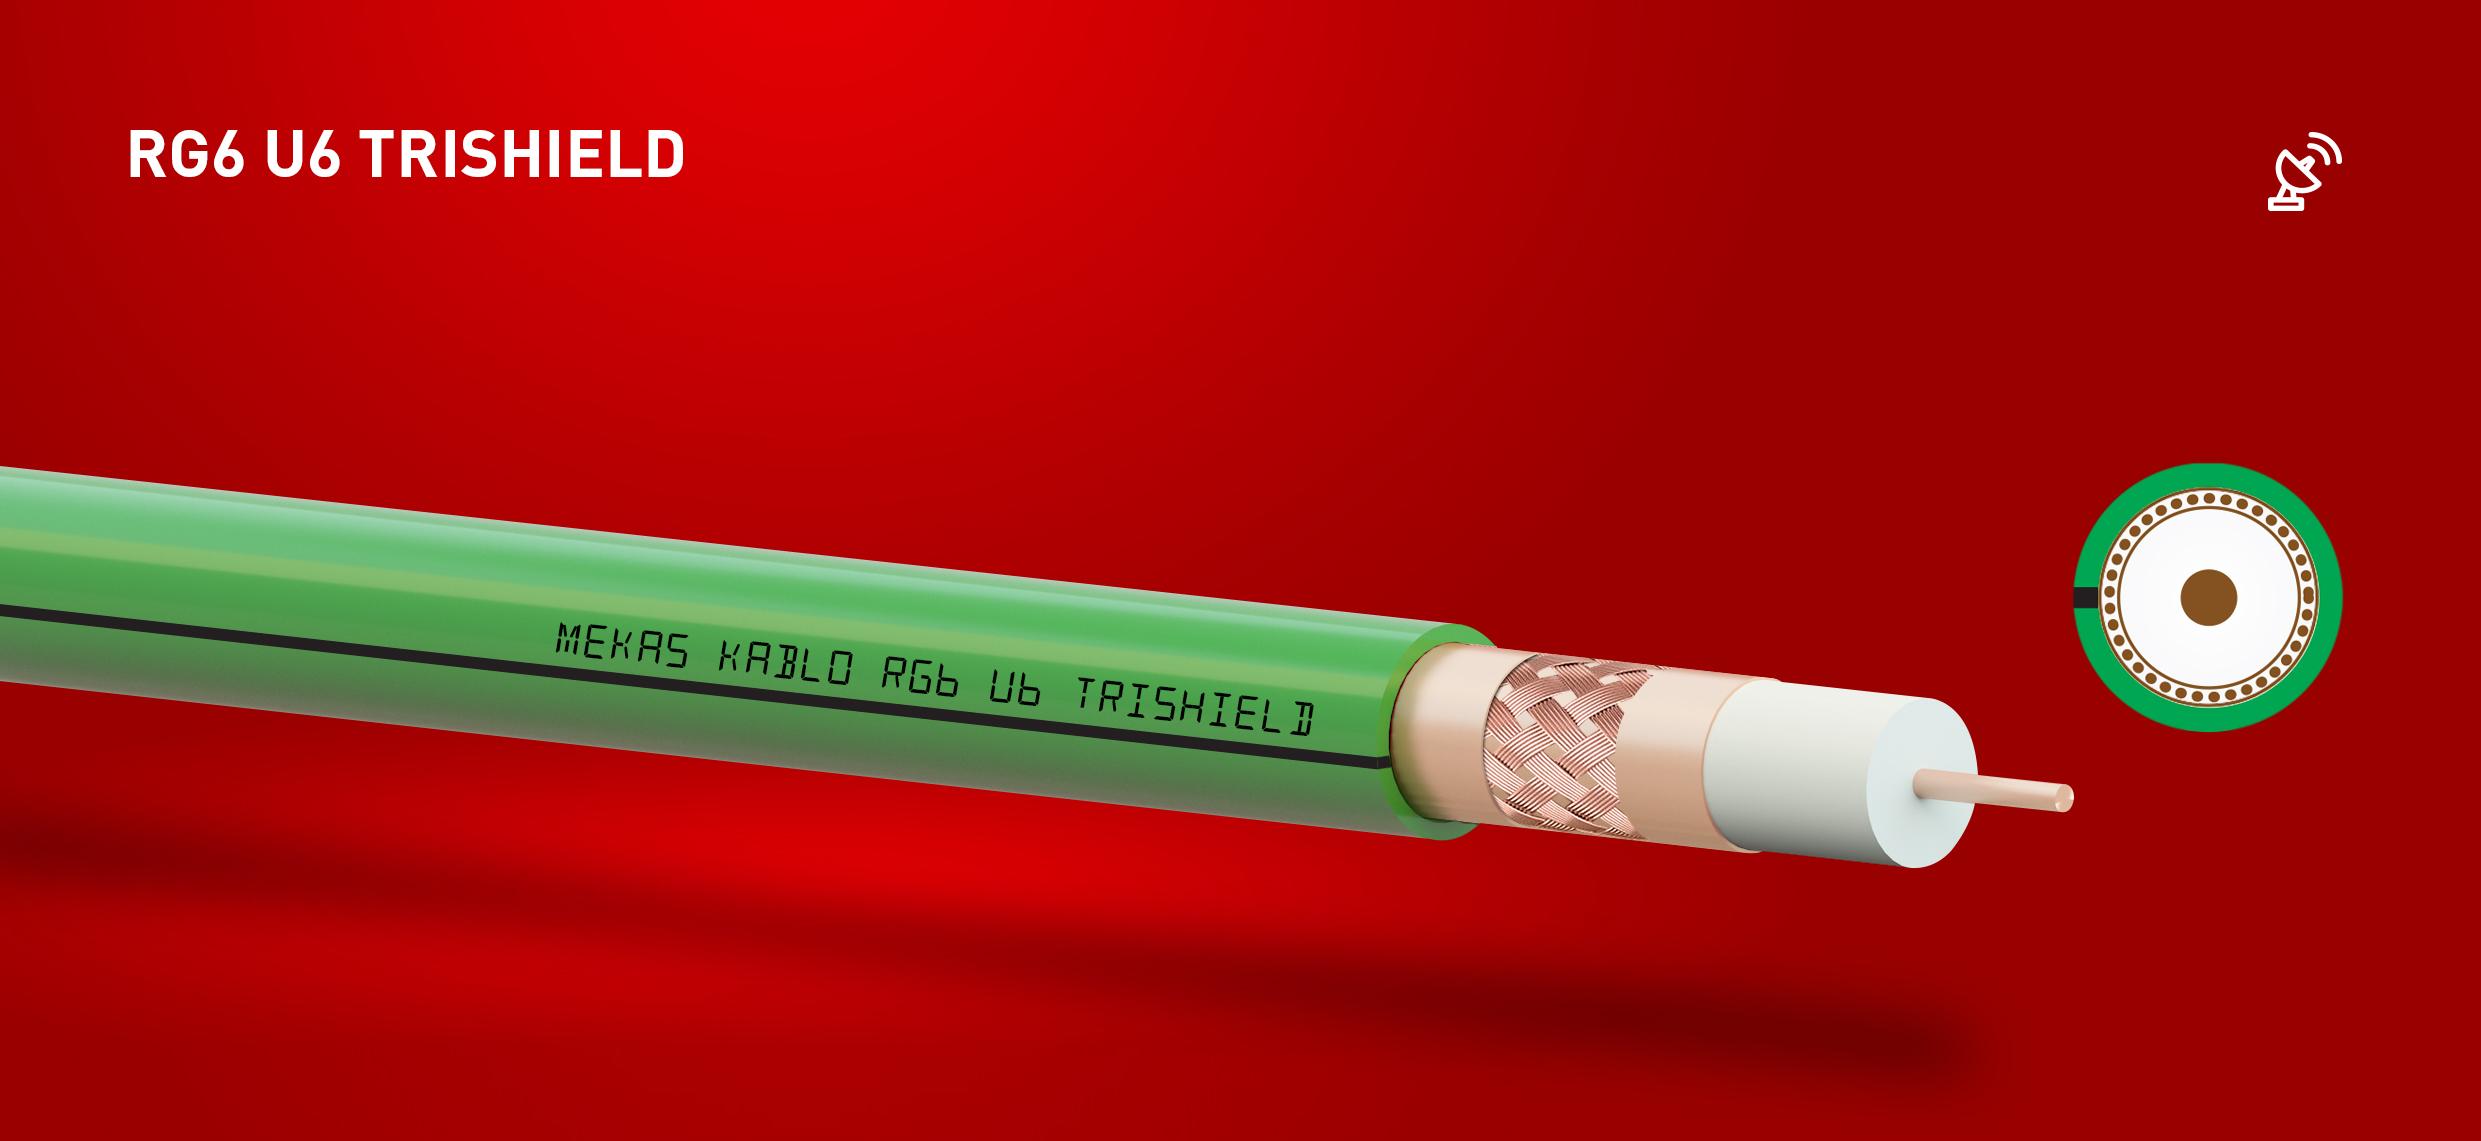 koaksiyel kablo rg6 u6 trishield